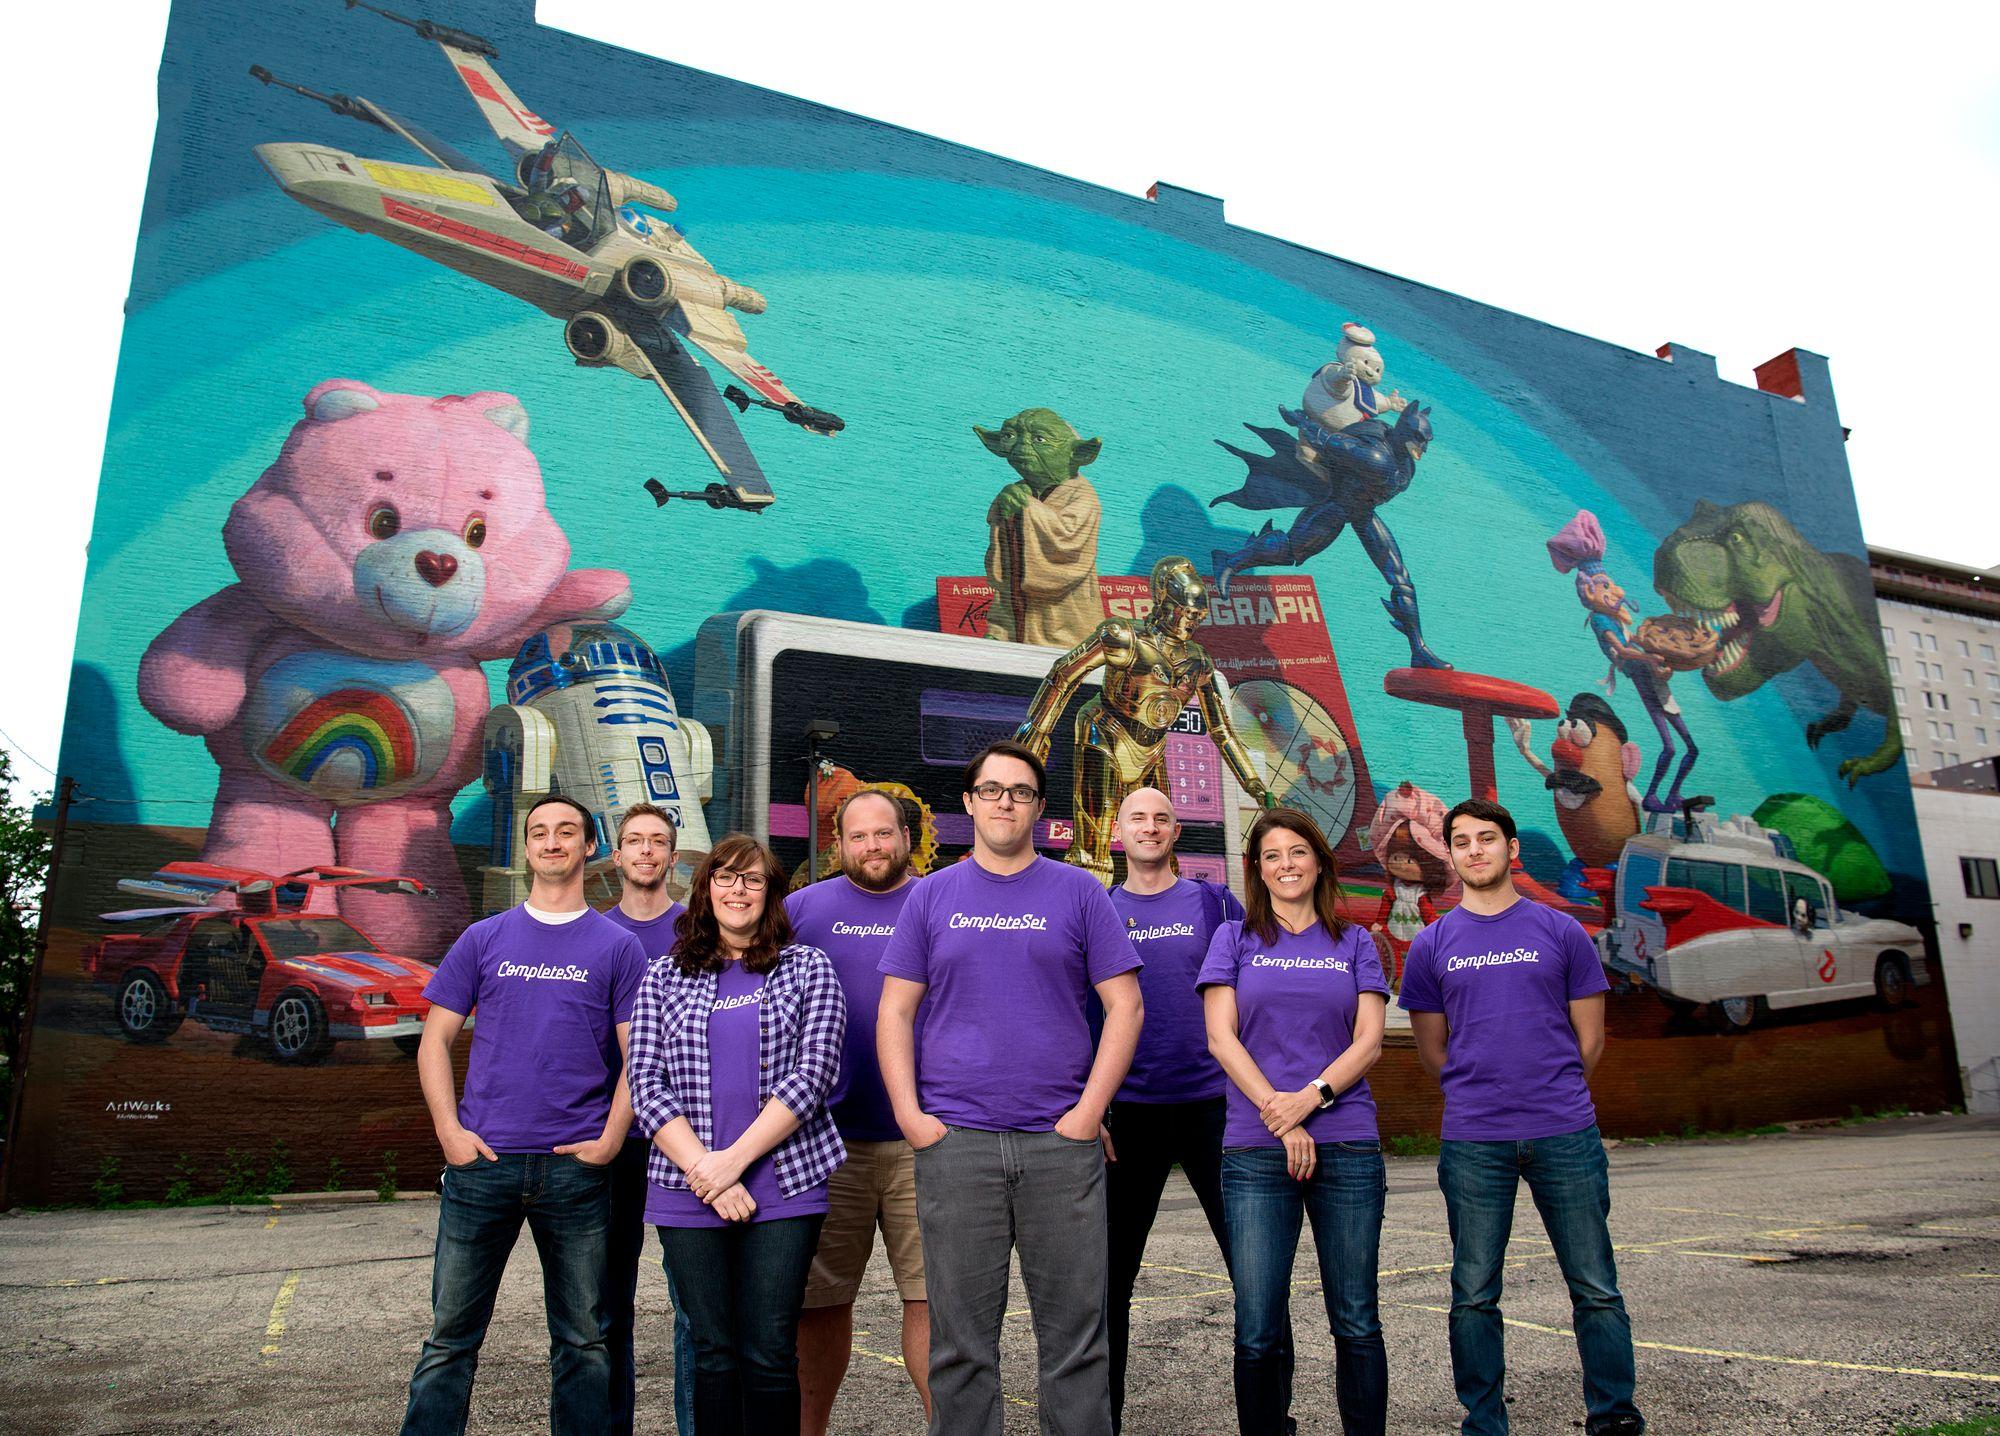 CompleteSet team in front of the Cincinnati Toy Heritage Mural, 2017